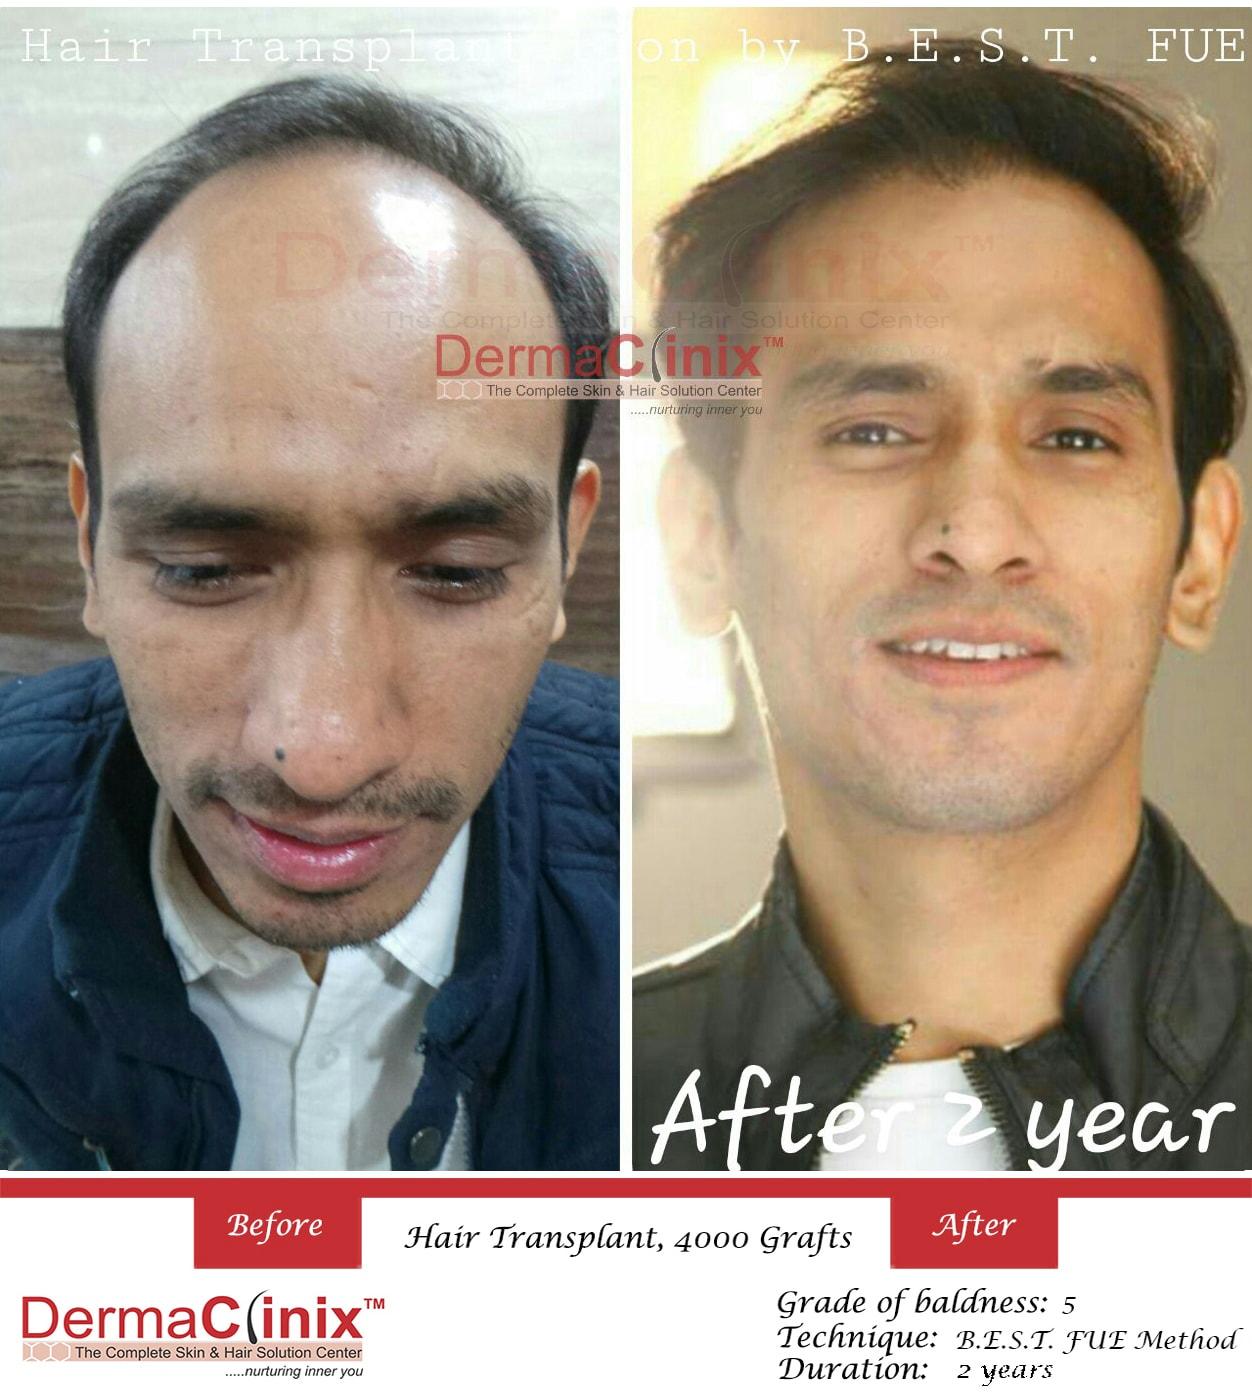 31391dccb47c8664f0f33e57c5f291b46290d_BEST-fue-hair-transplant.jpg